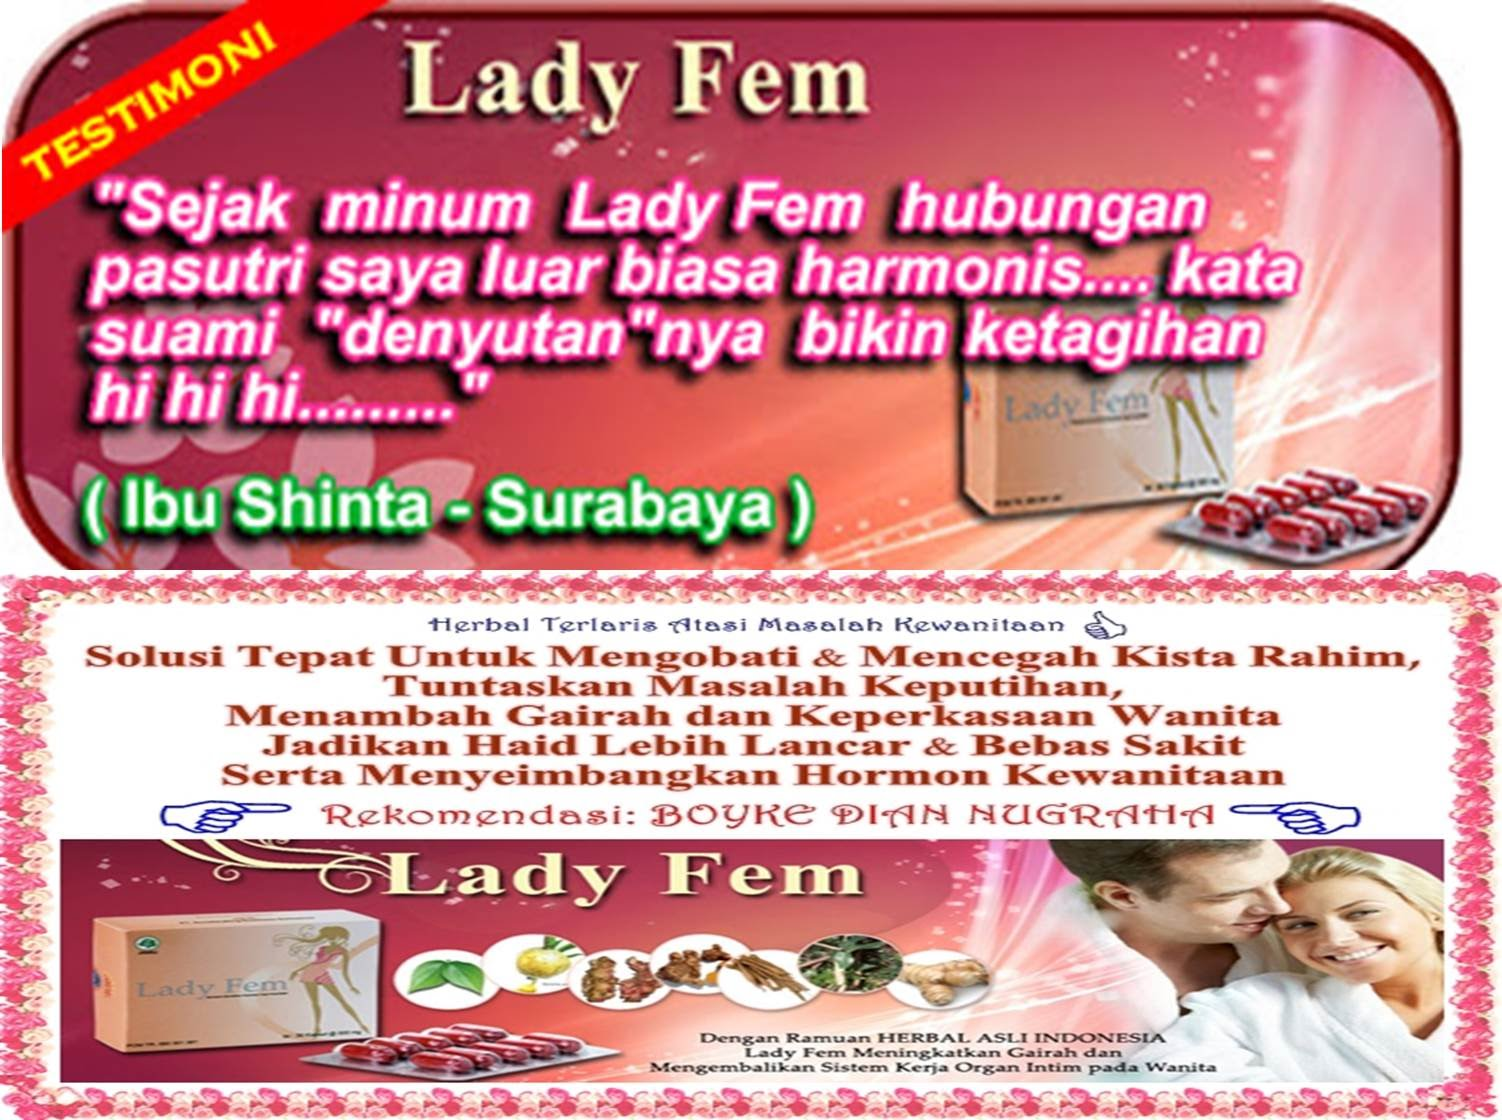 Ladyfem - Blanja.com